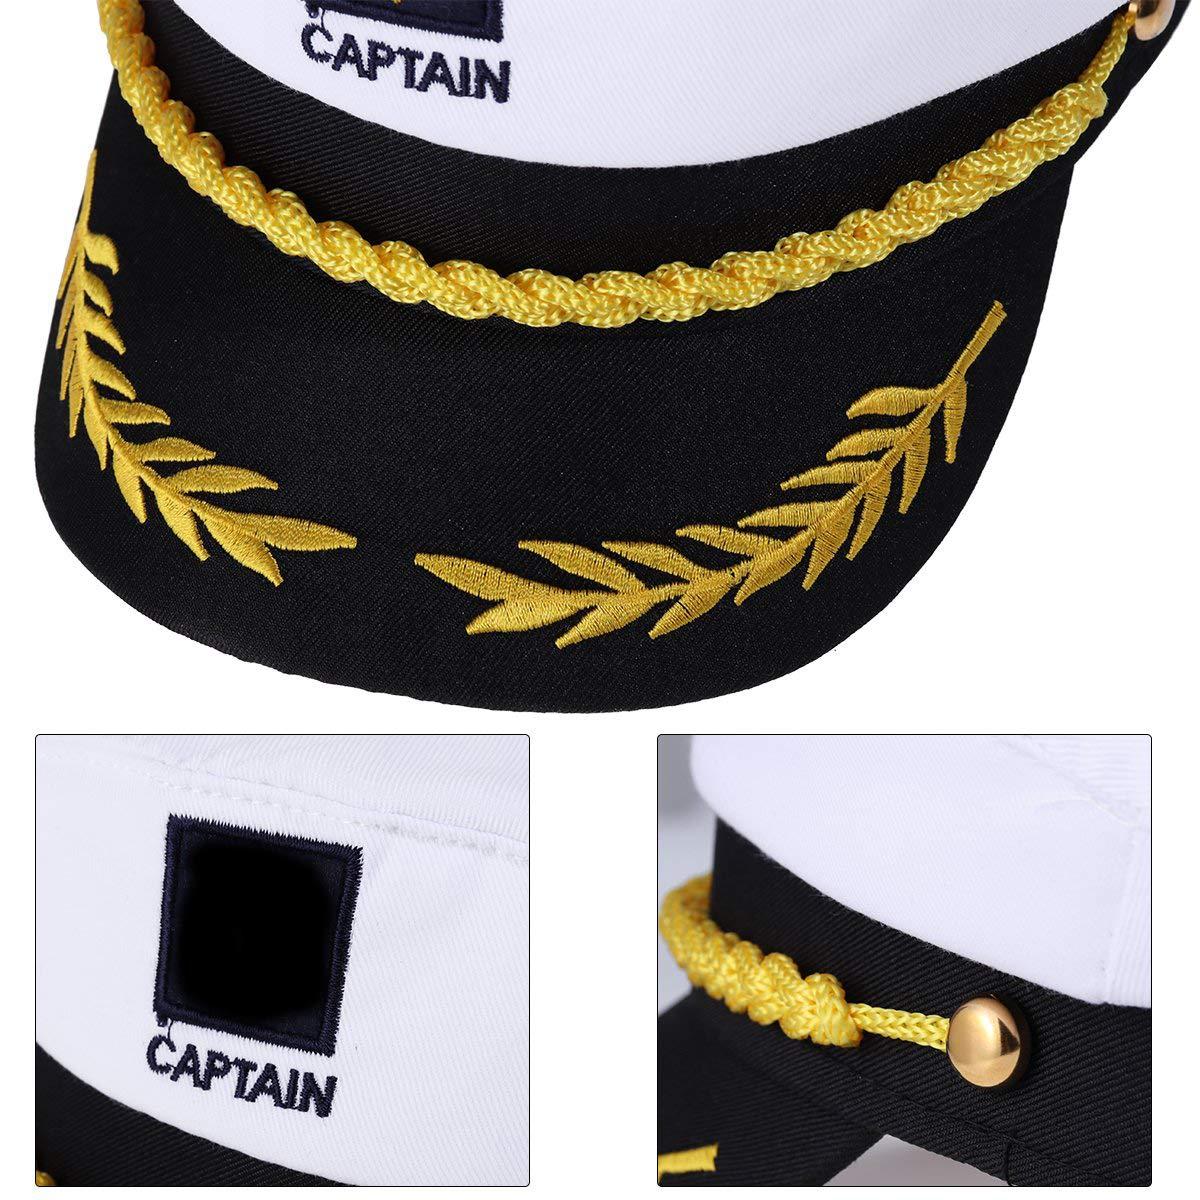 WENTS Capitán Adulto Sombrero de Cosplay Gorra Yate Barco ...